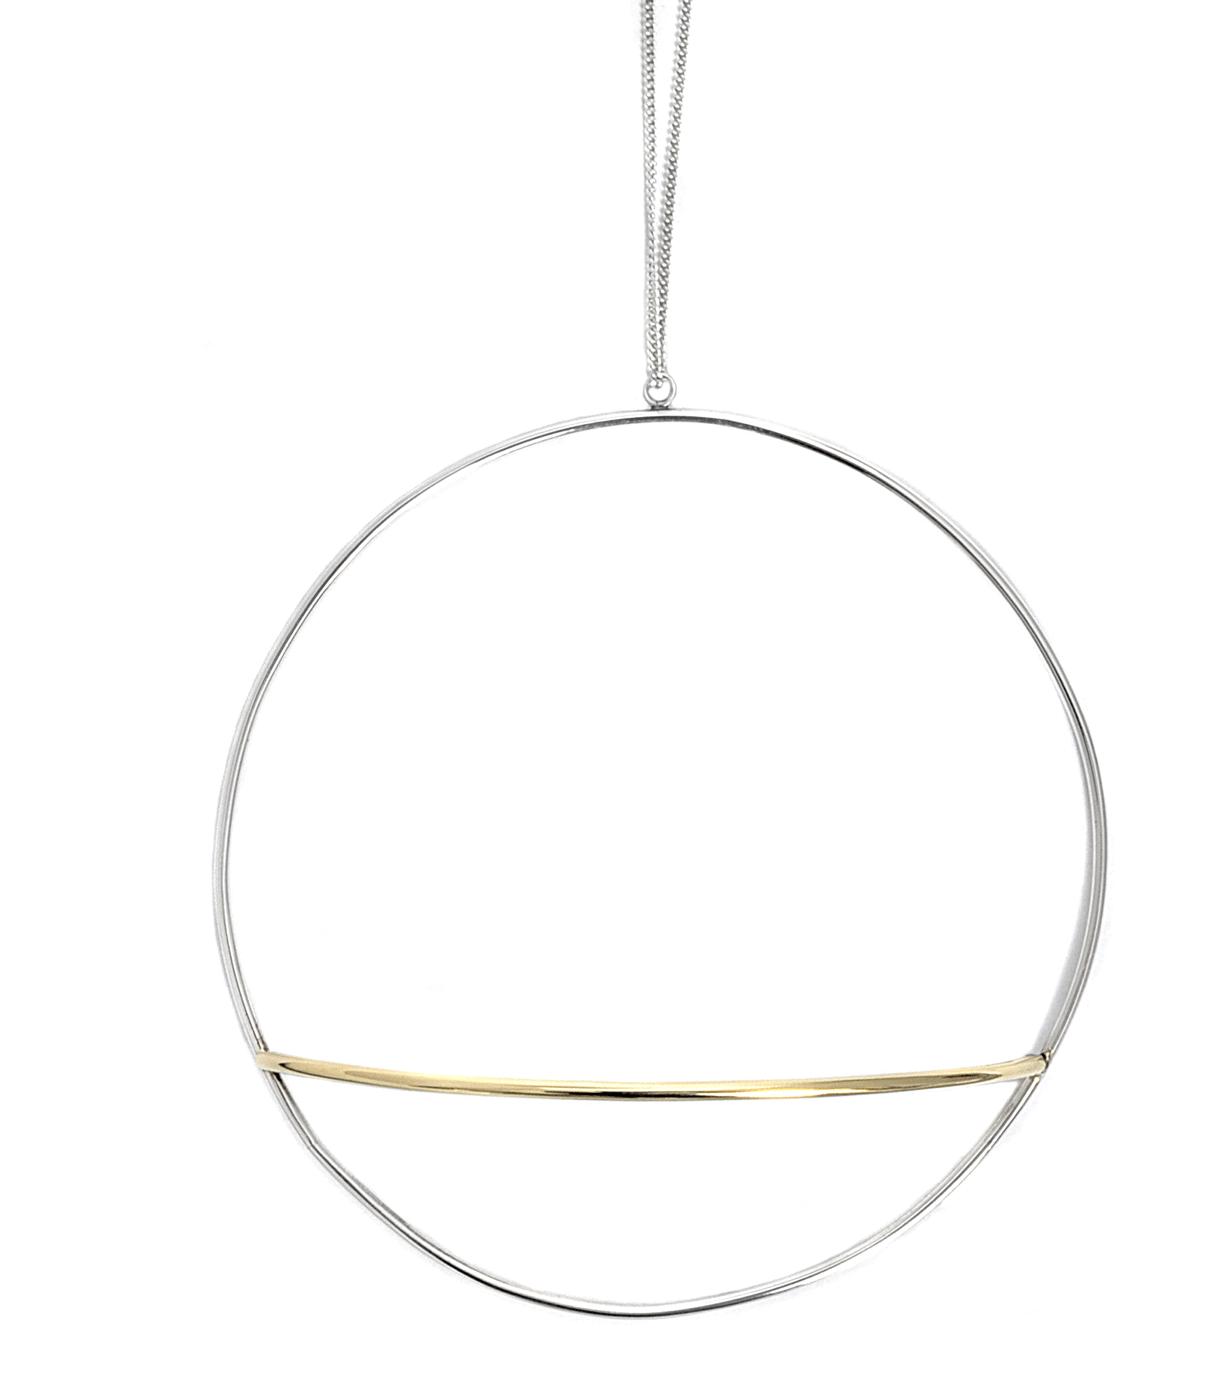 Adeline Cacheux Jewelry Design sautoir bi-matières